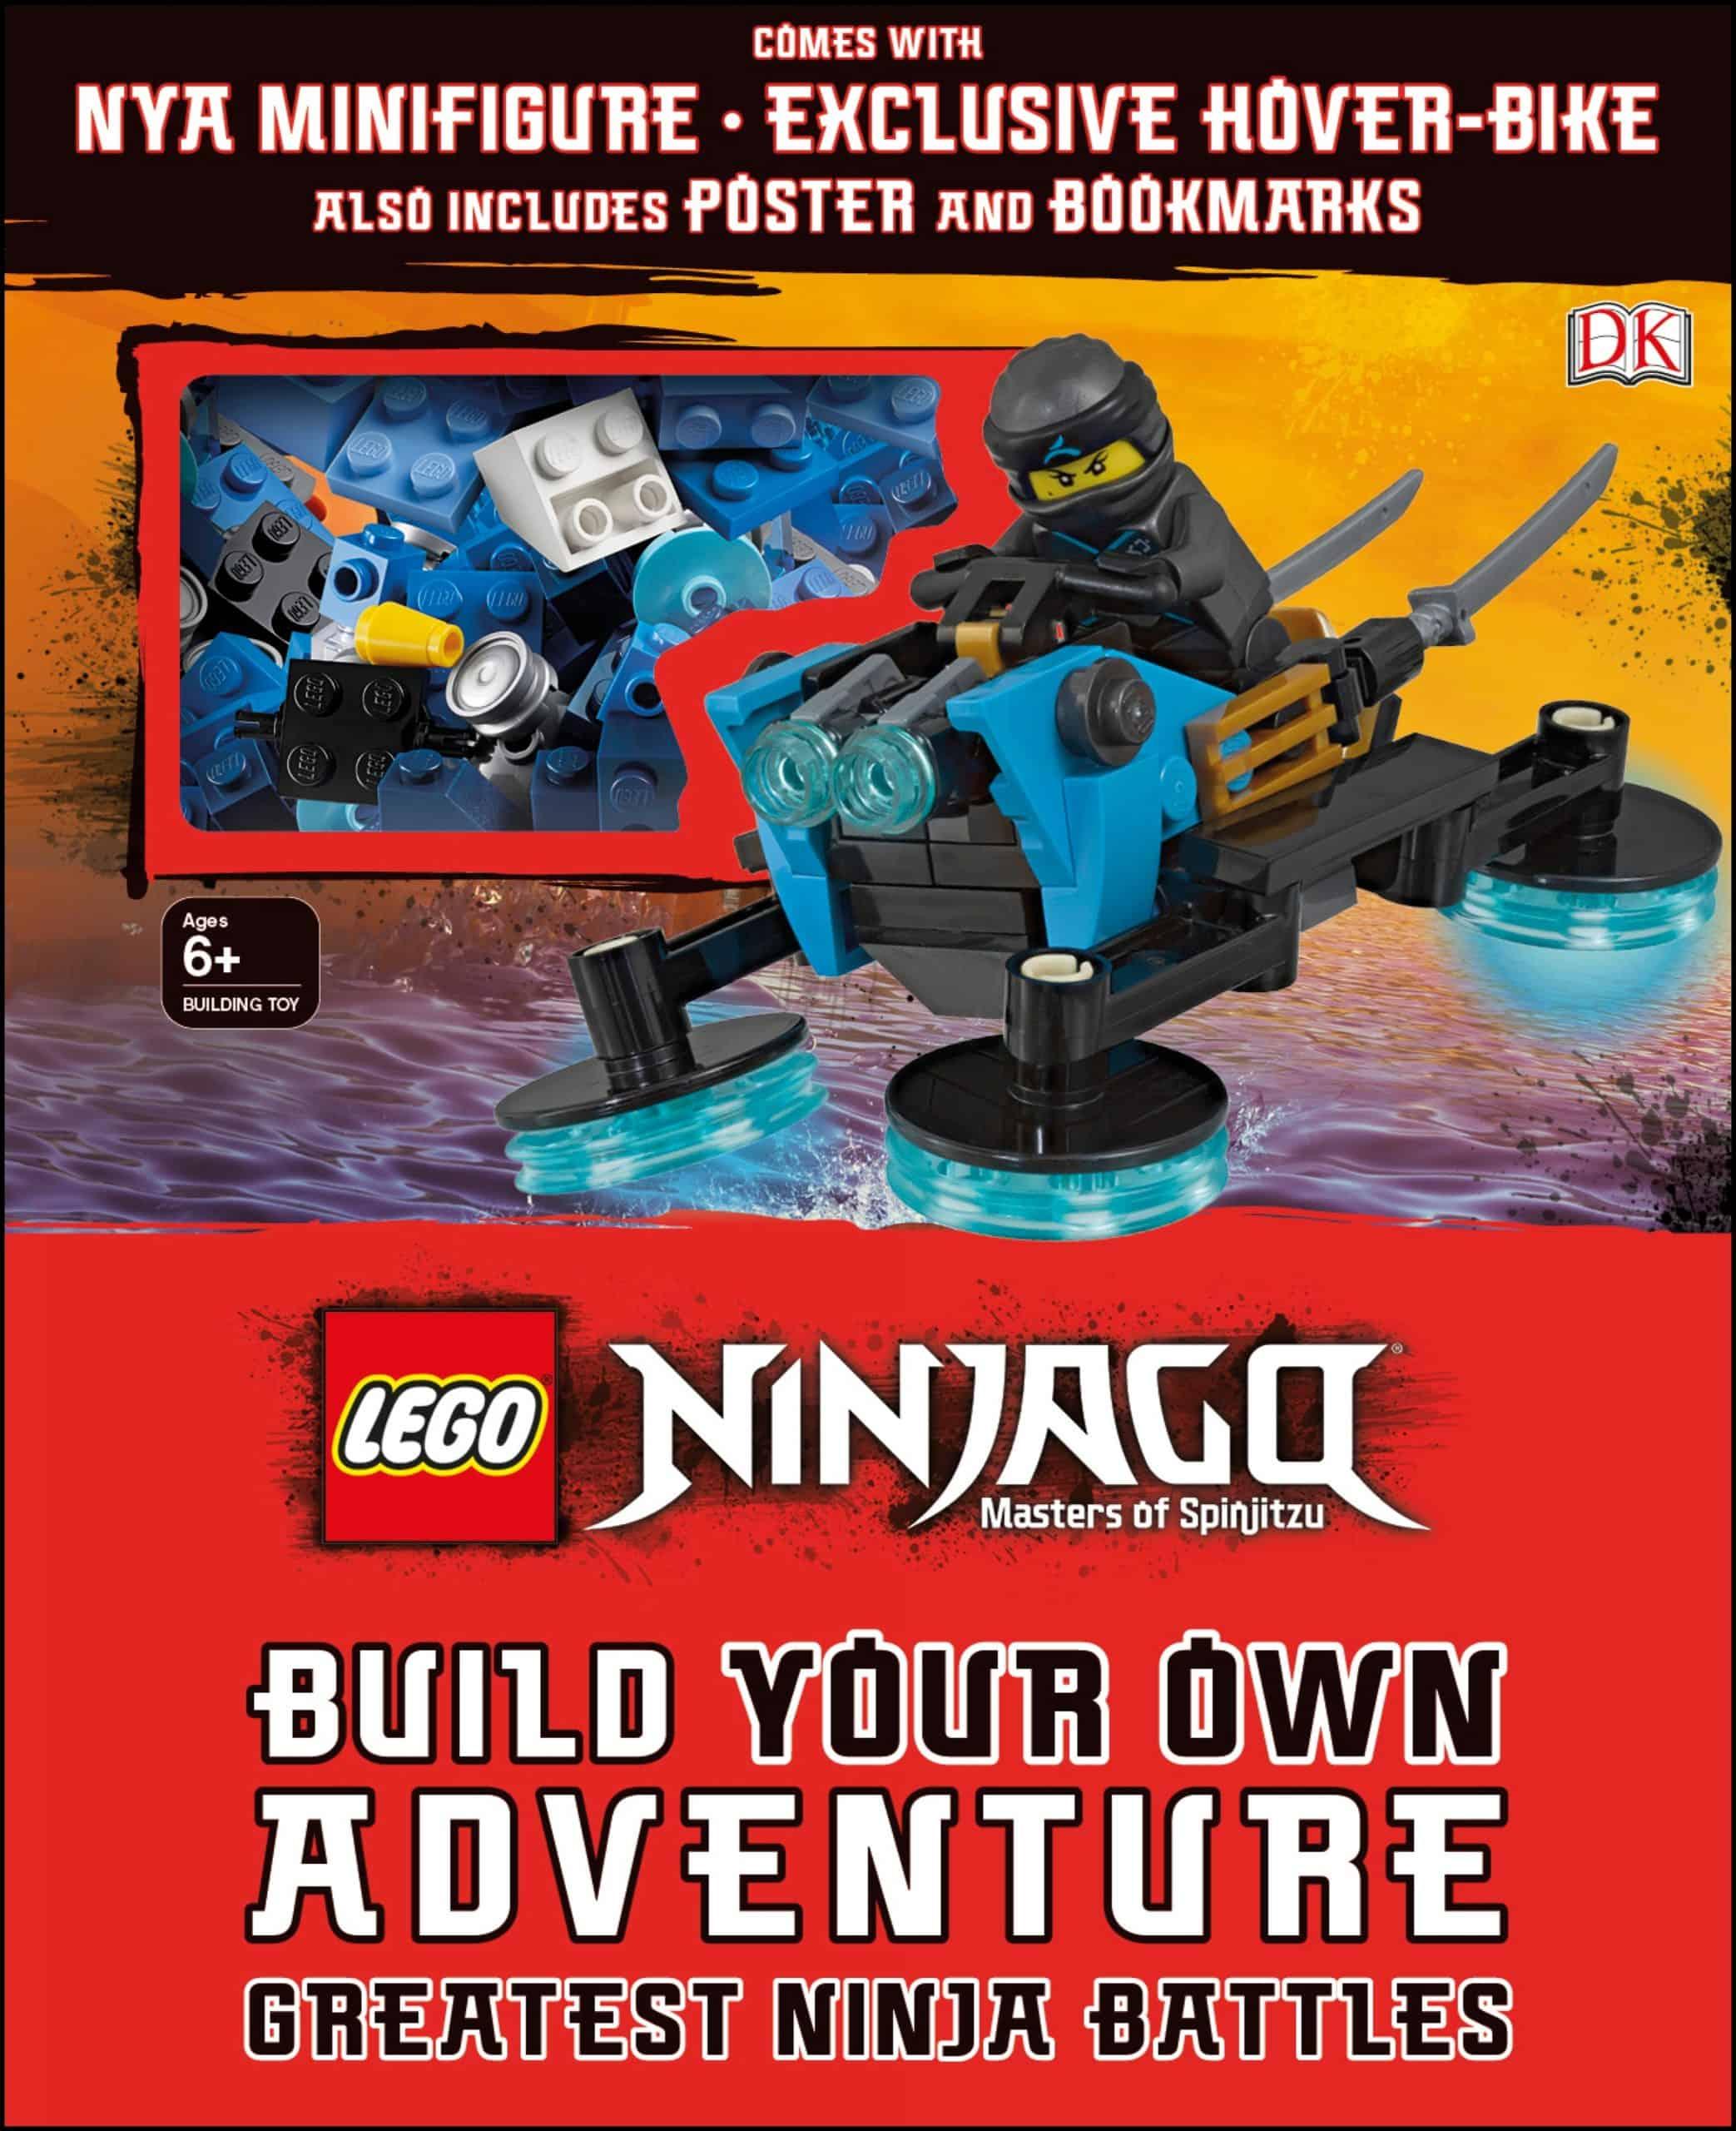 lego 5005656 ninjago build your own adventure greatest ninja battles scaled